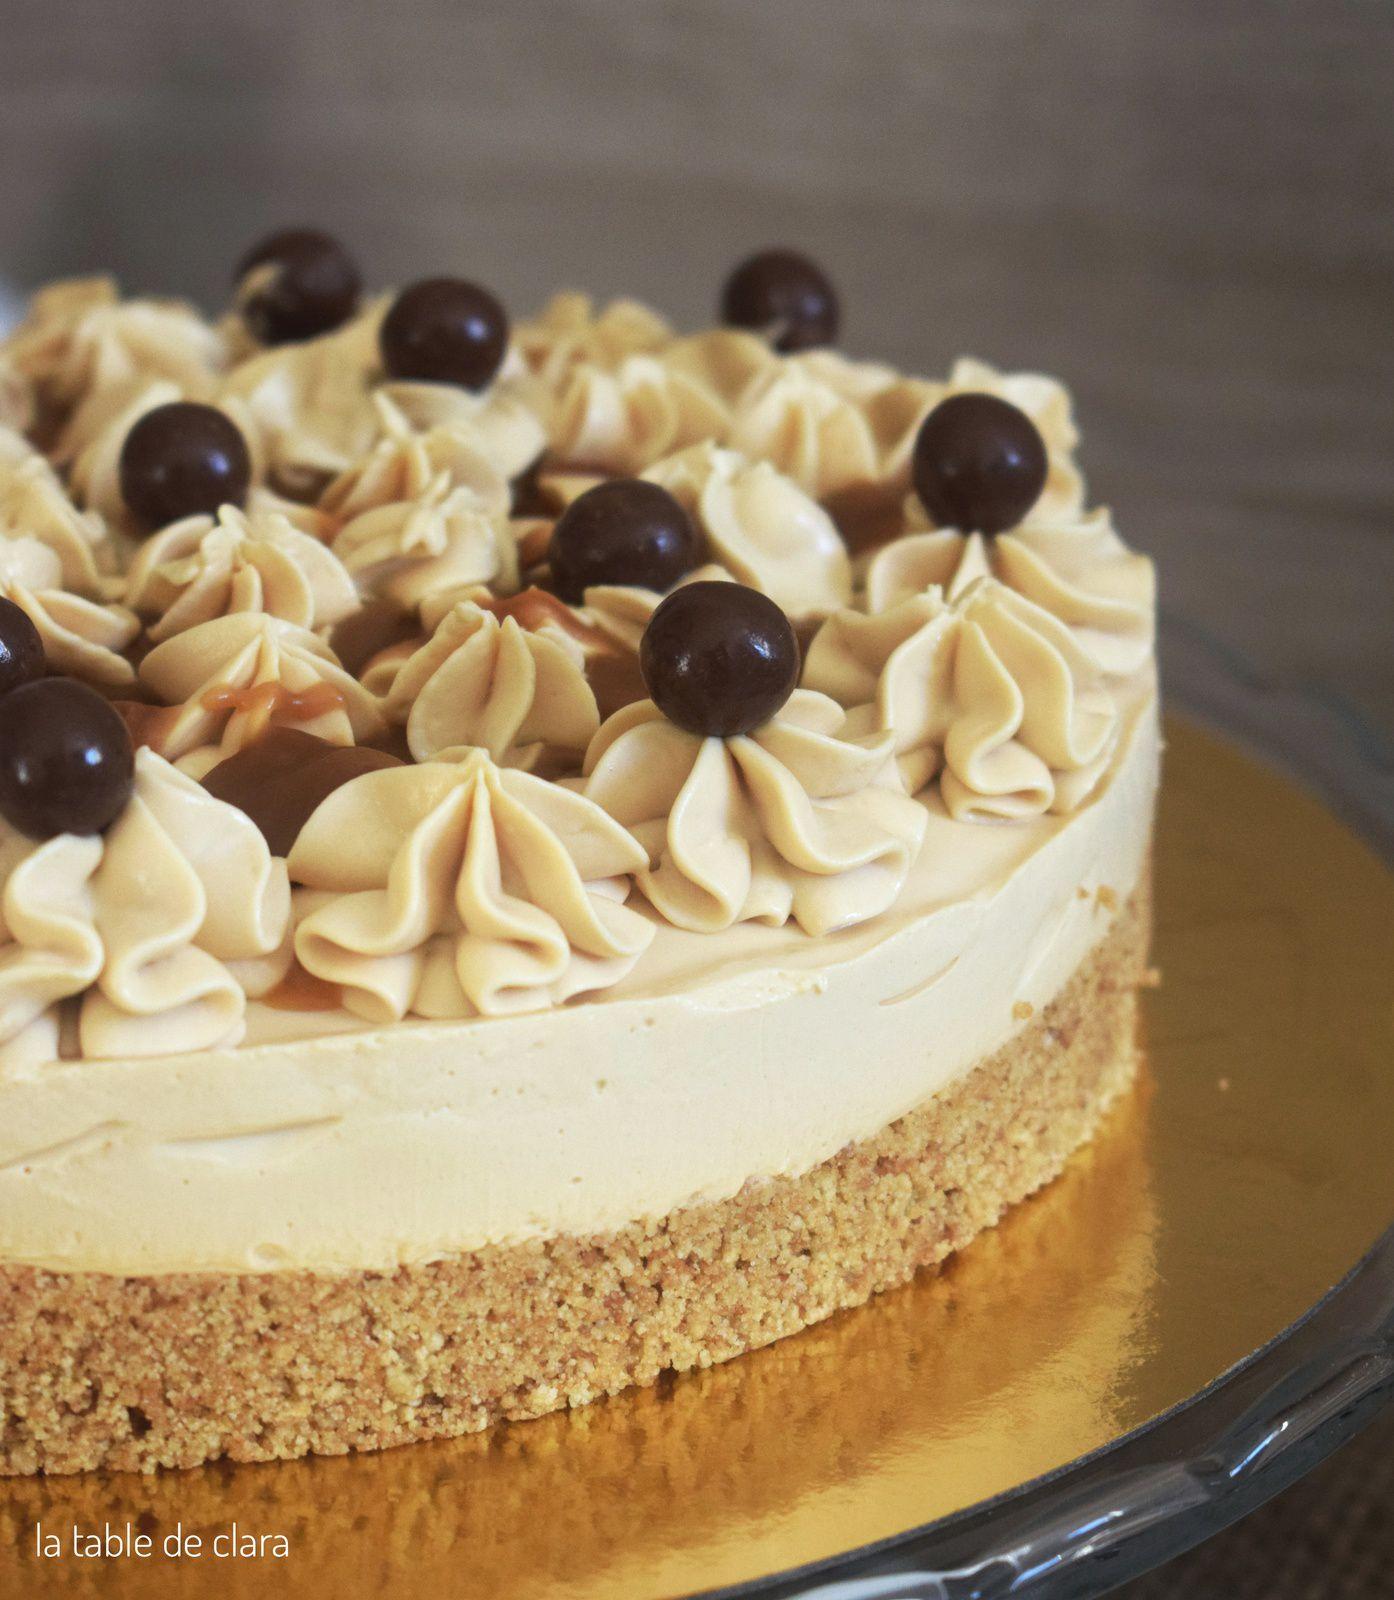 Cheesecake au caramel beurre salé